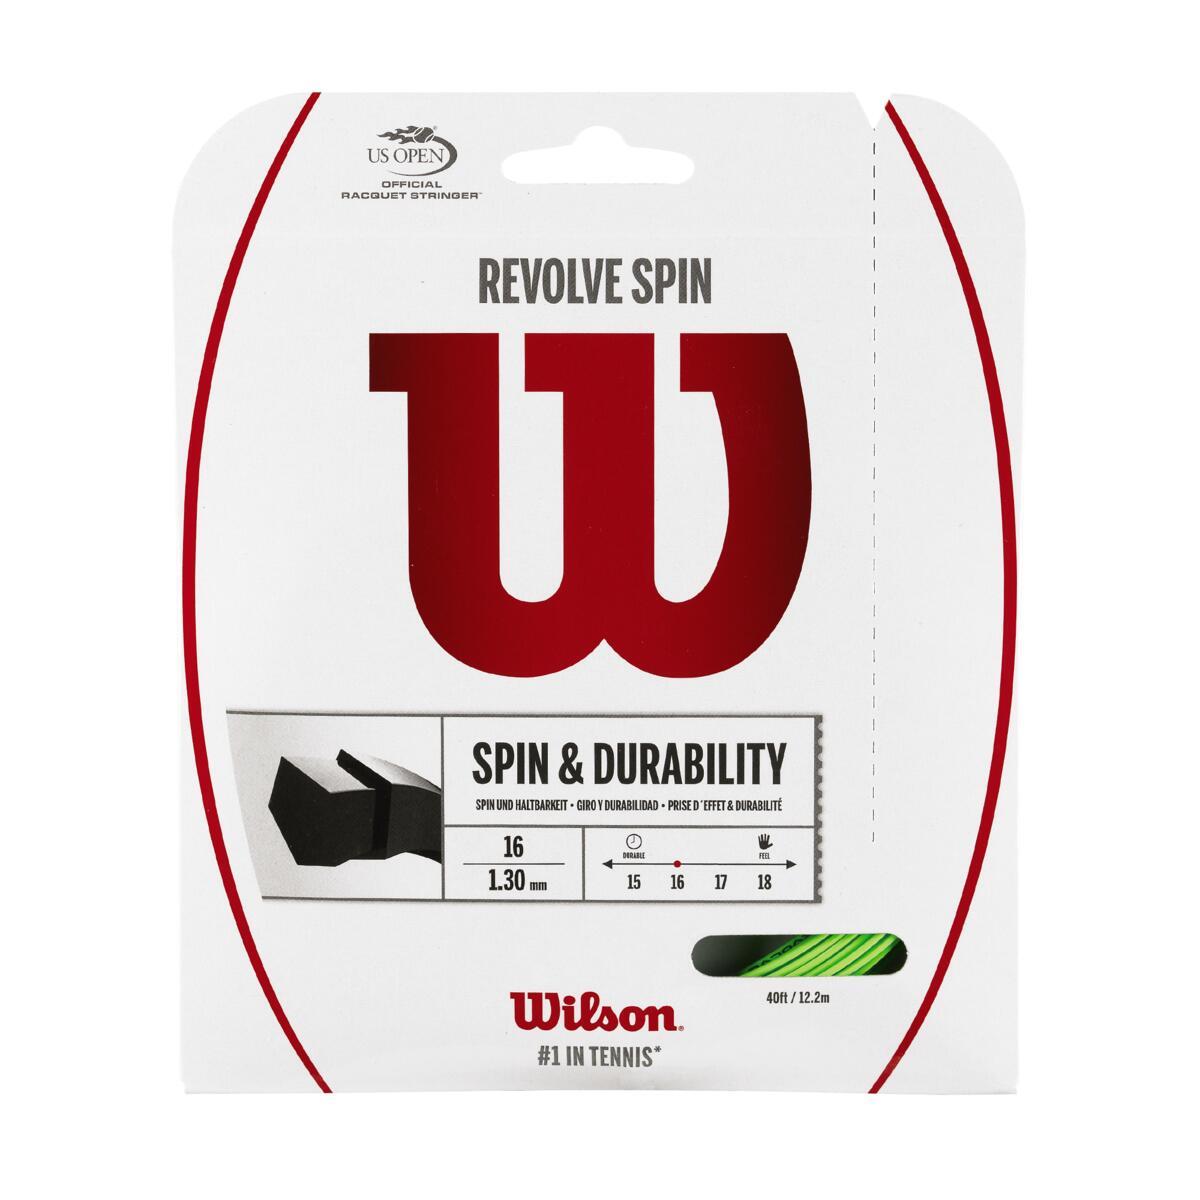 Wilson Revolve Spin 12.2m 1,30mm